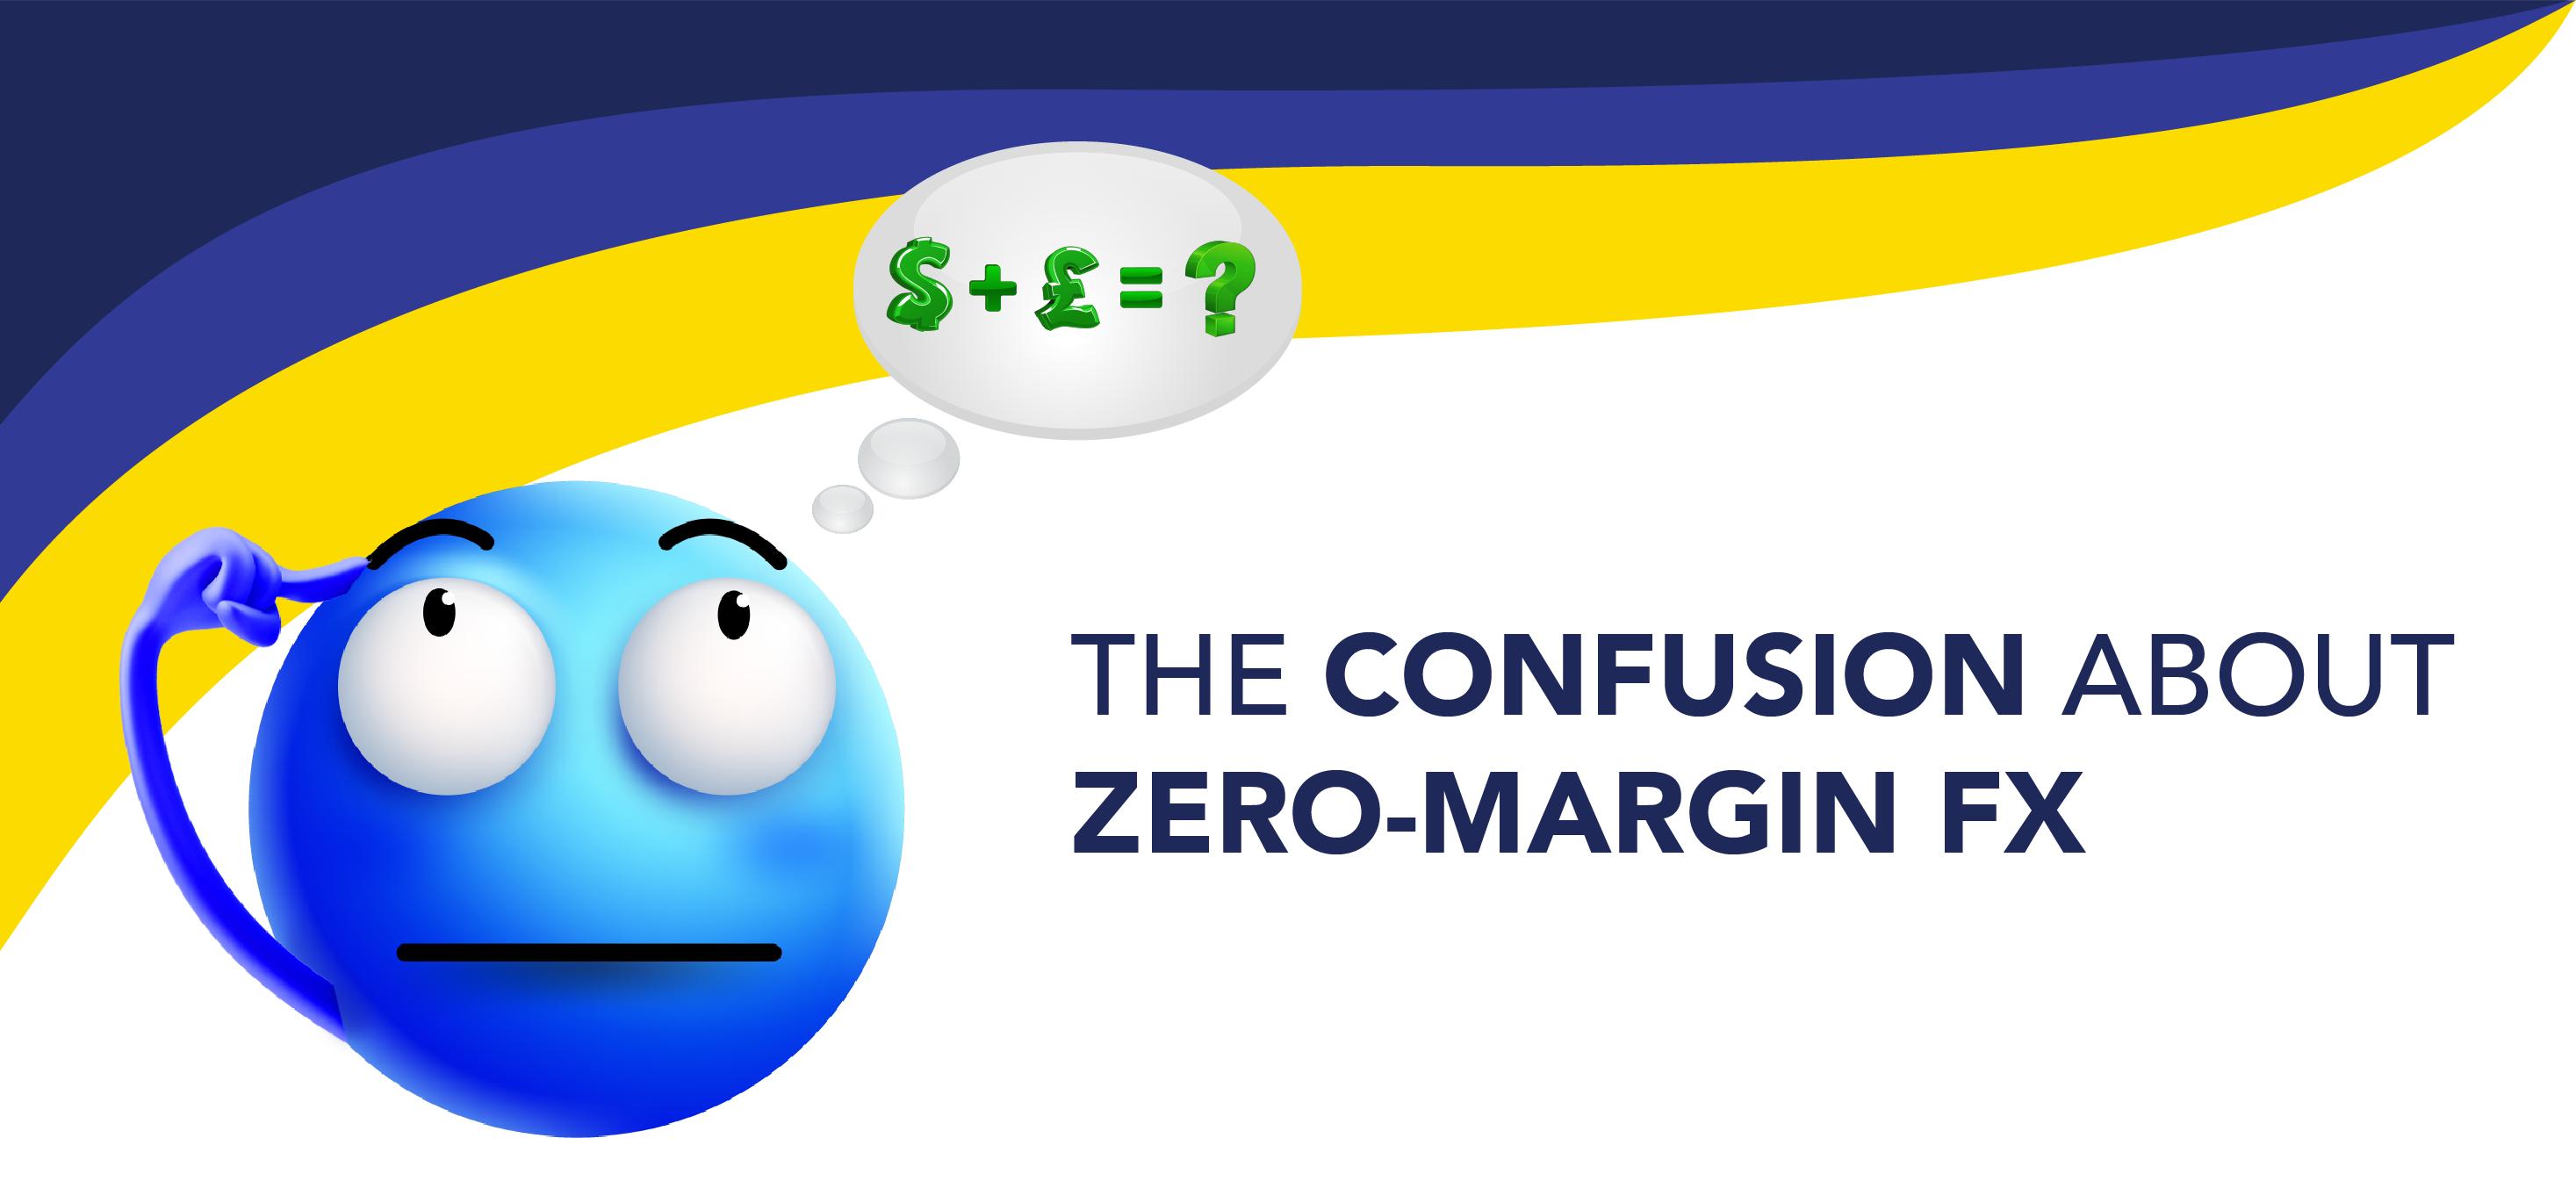 6 Emojis Of Money Transfer